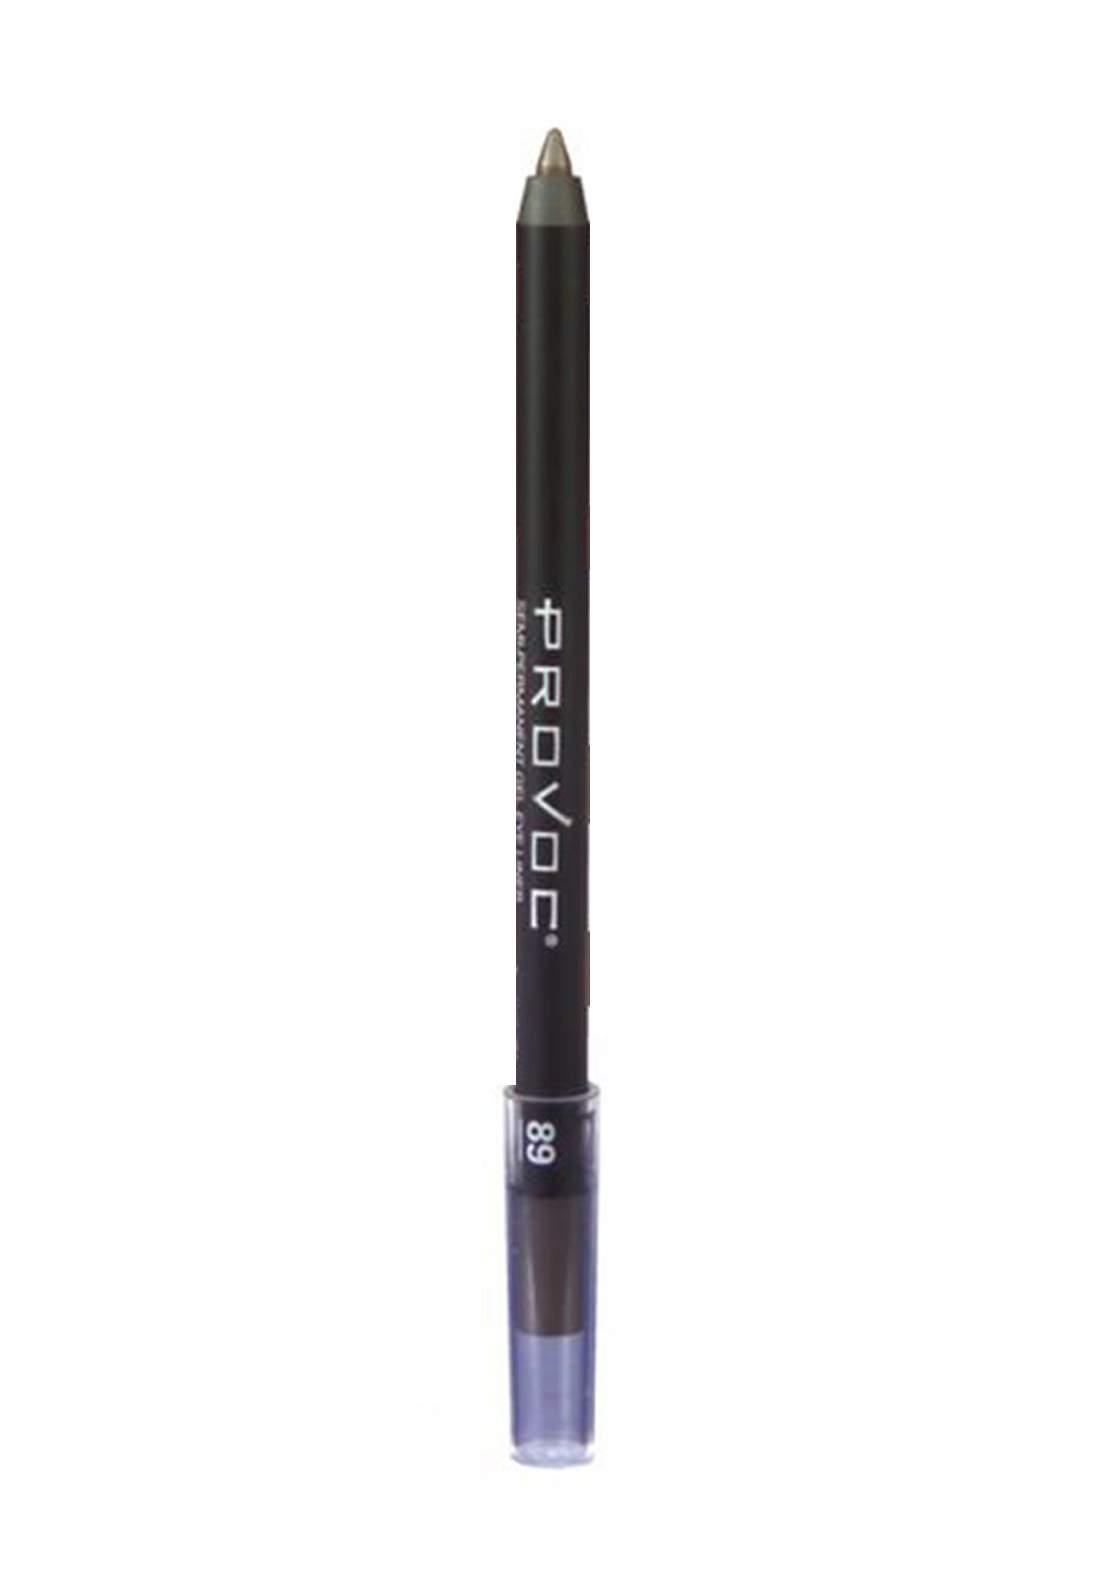 Provoc 353-0019 Semi-Permanent Waterproof Gel Eye Pencil No.89 Sweet Chocolate محدد العيون